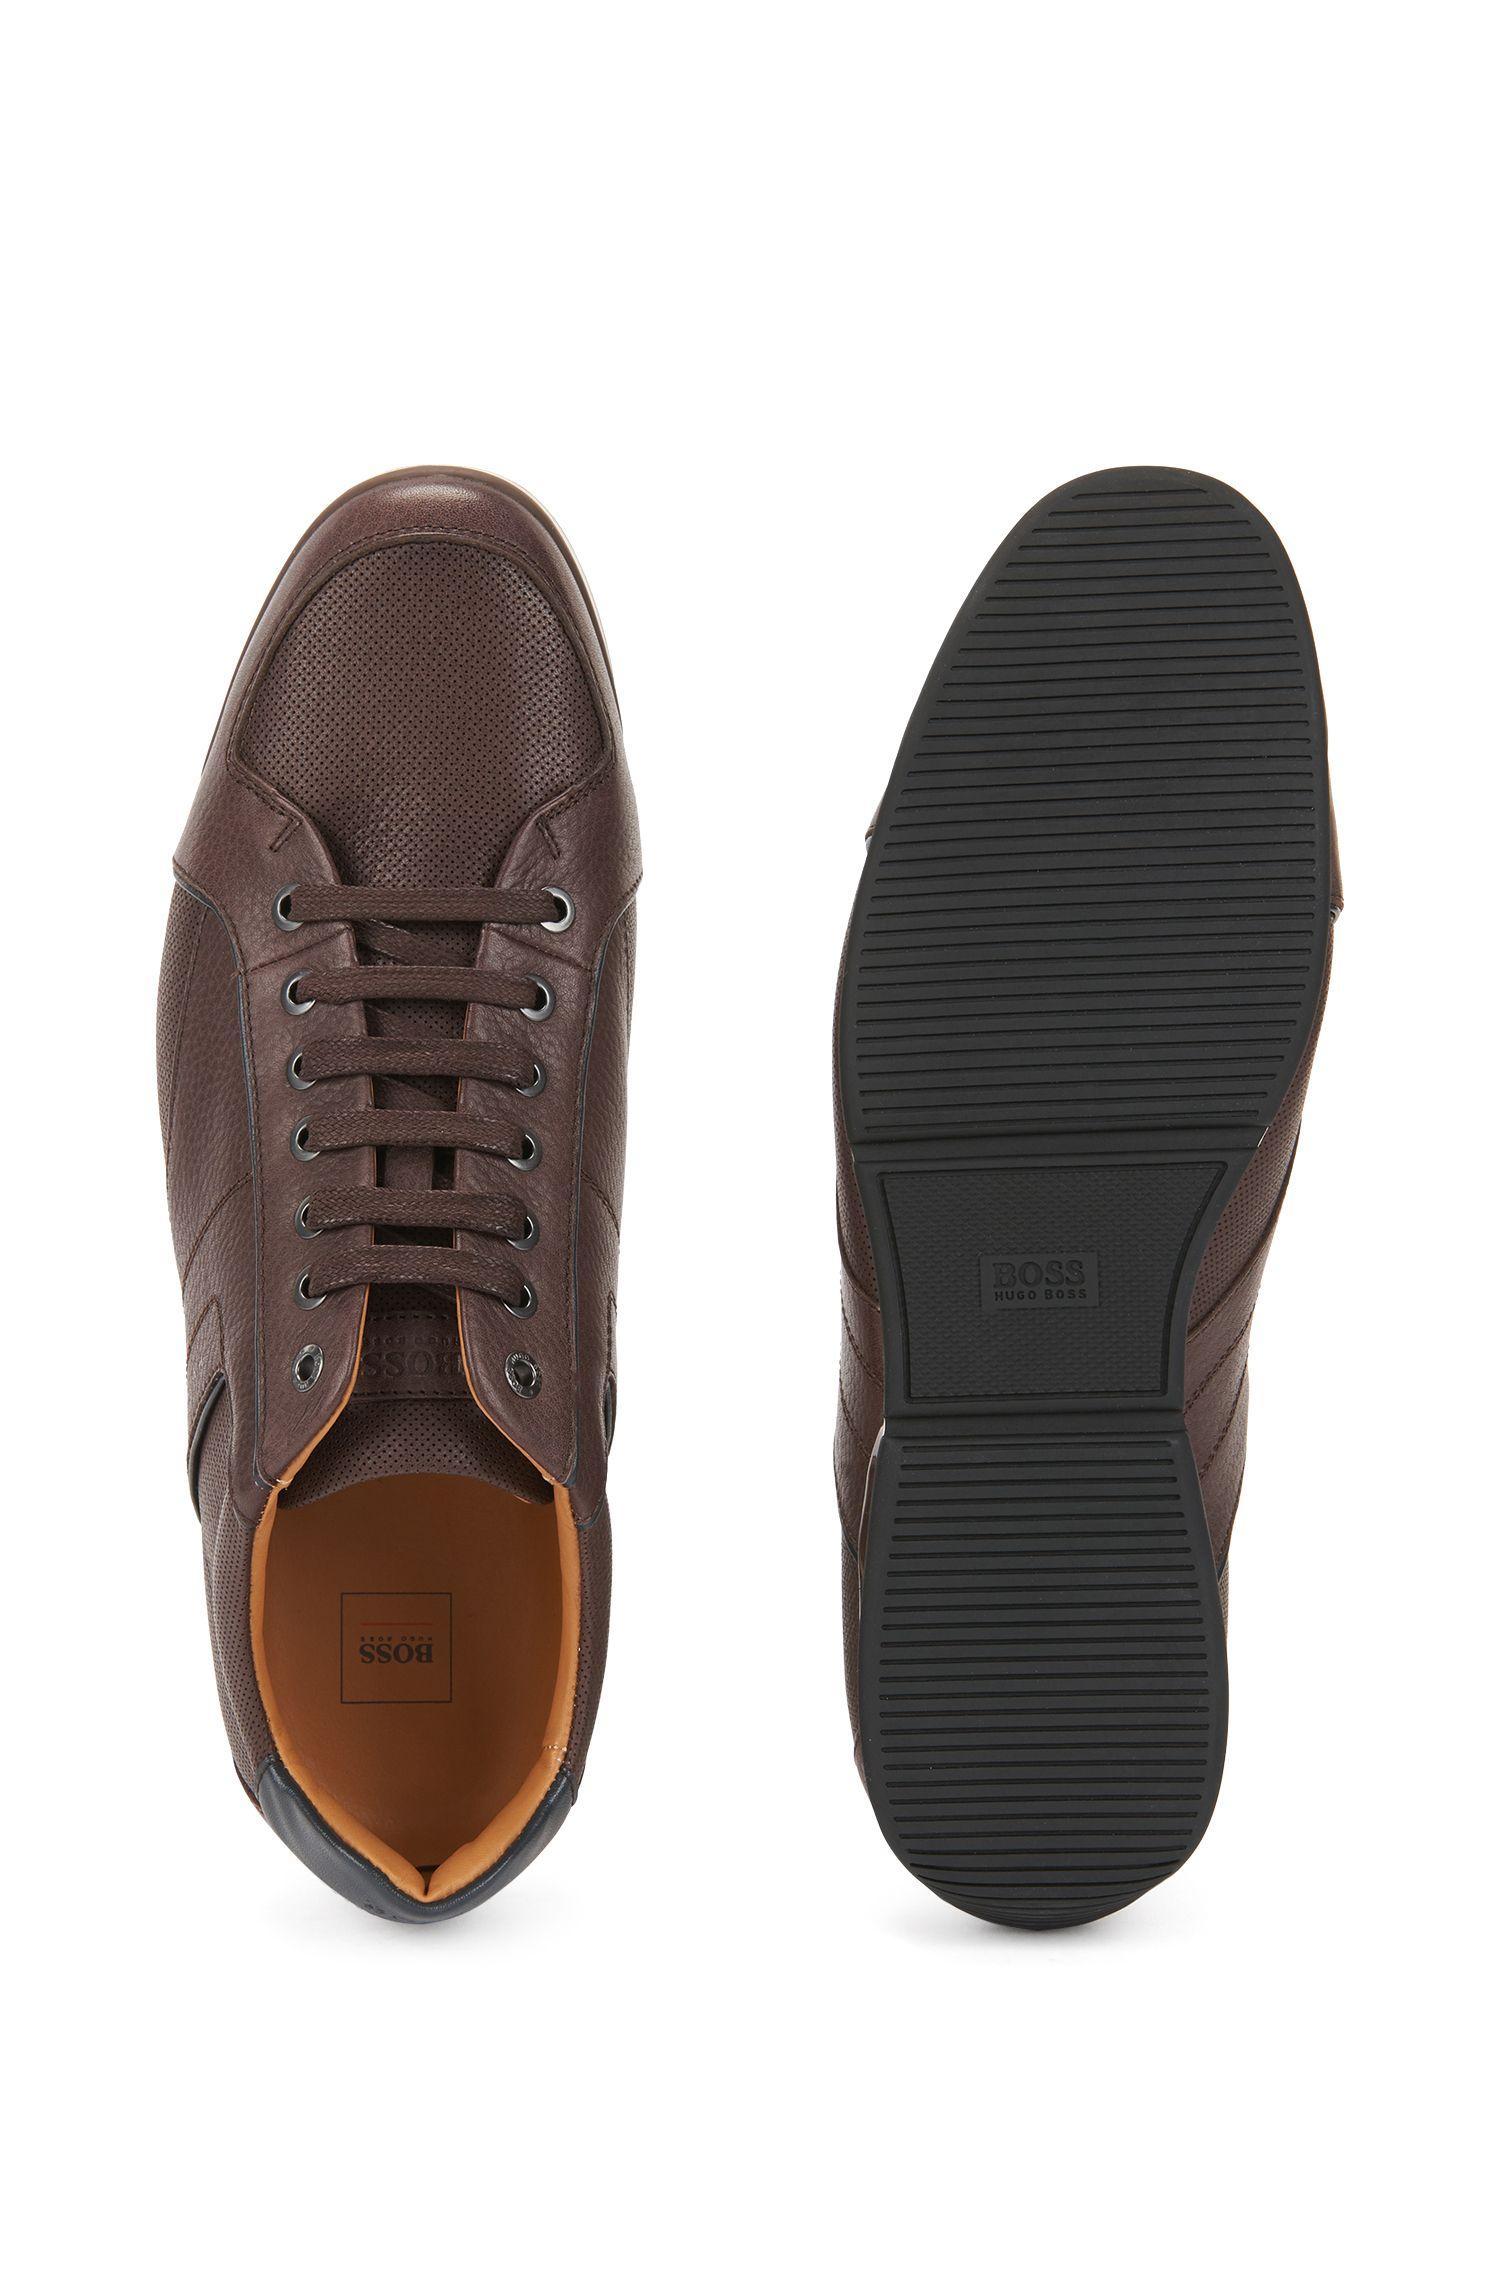 Lage sneakers van bewerkt leer met contrastdetail, Donkerbruin